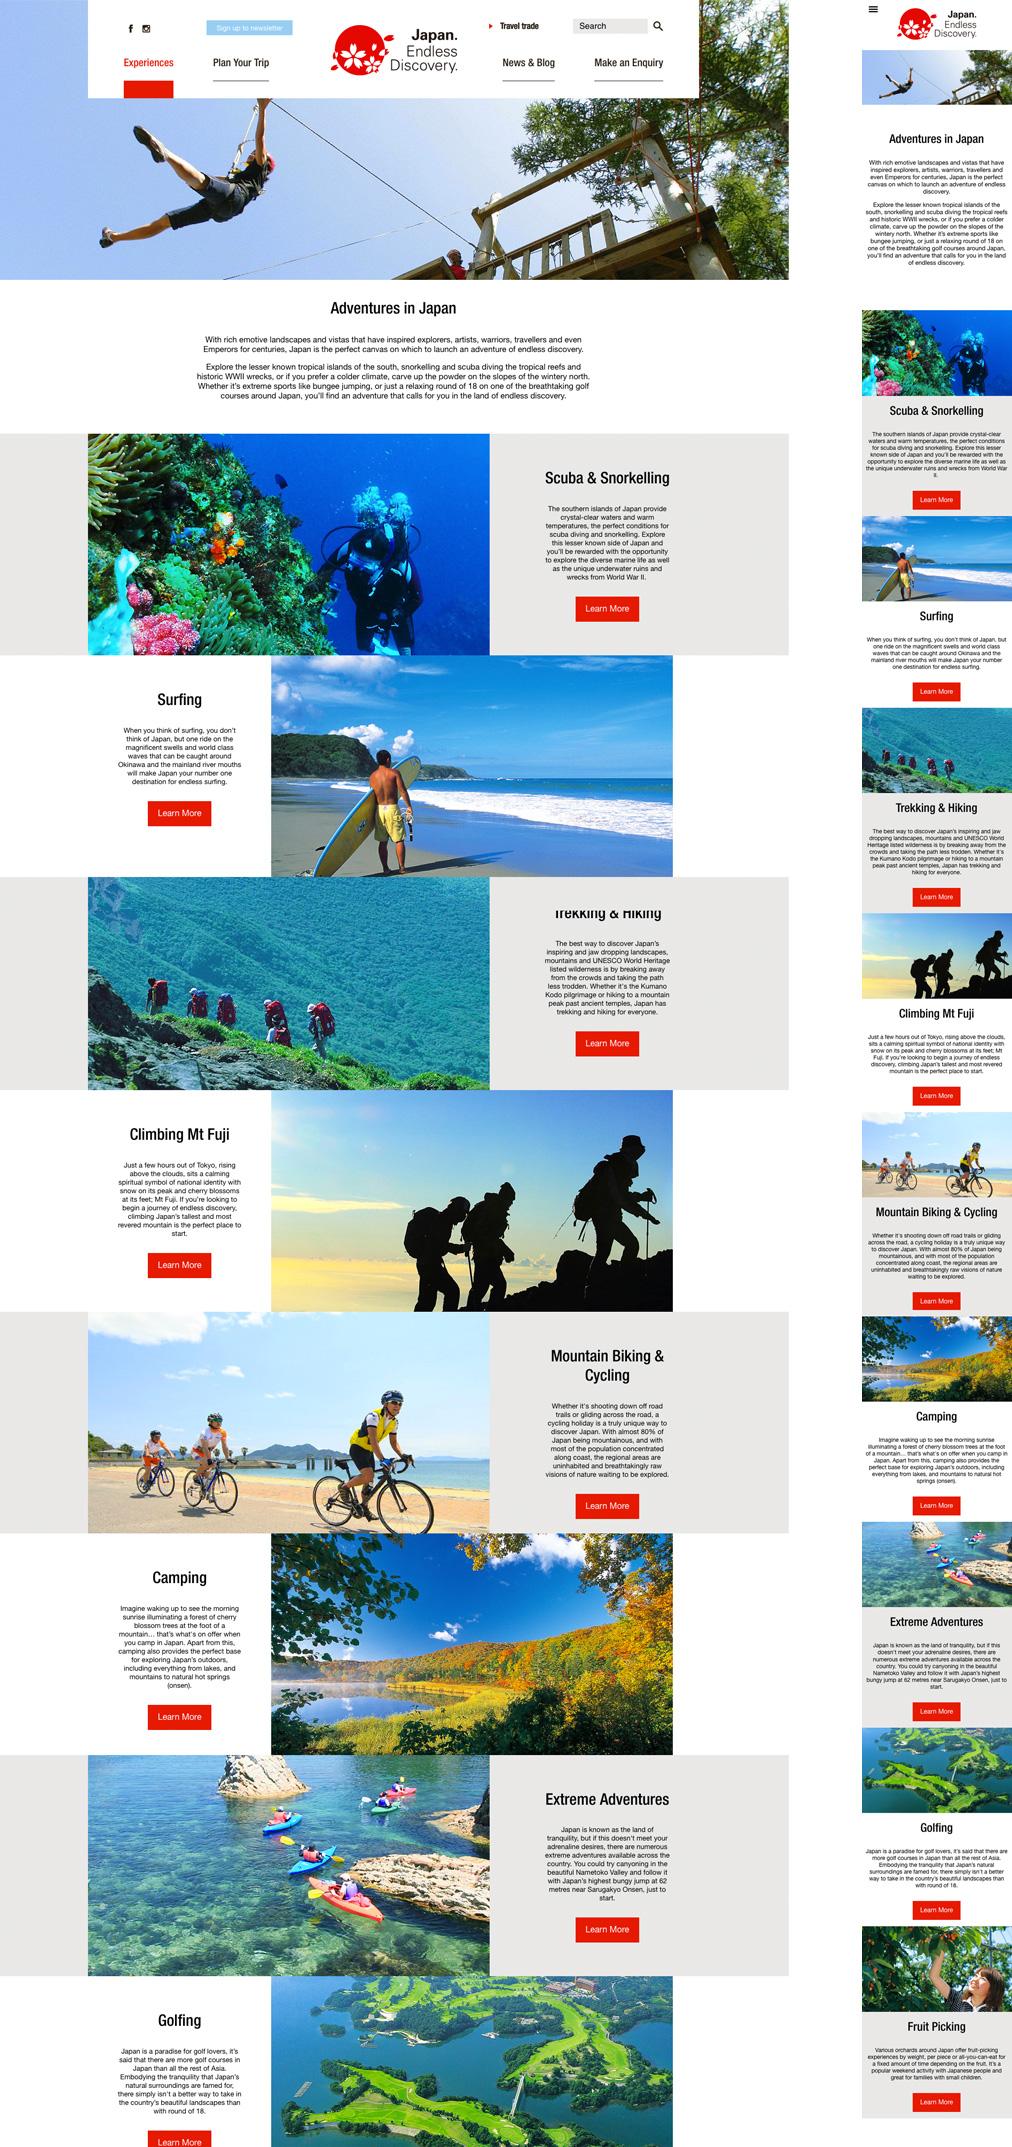 designs02.jpg